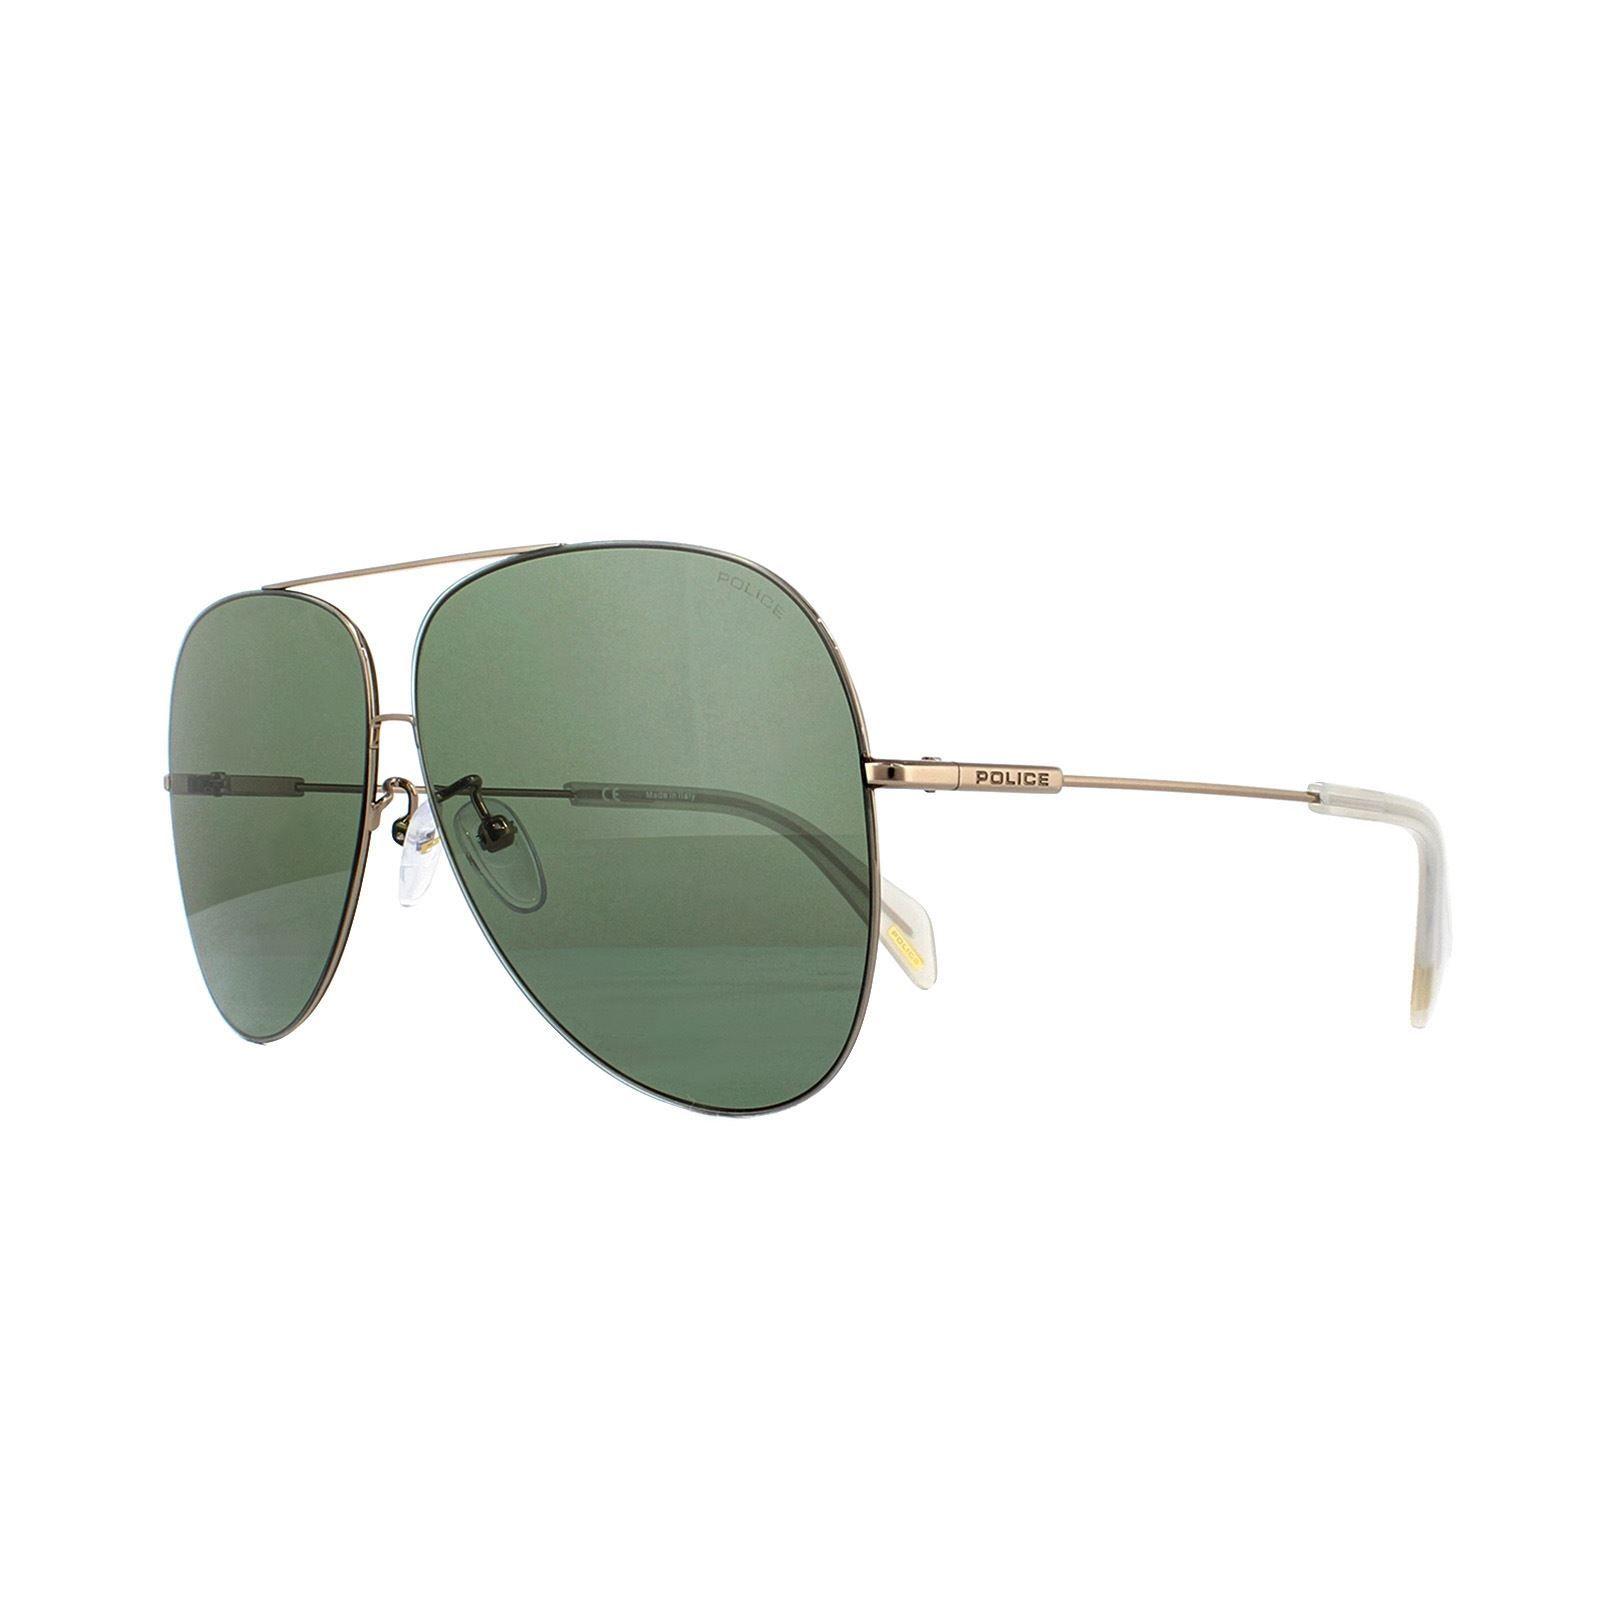 Police Sunglasses Goldeneye 3 SPL406M 8FFV White Gold Green